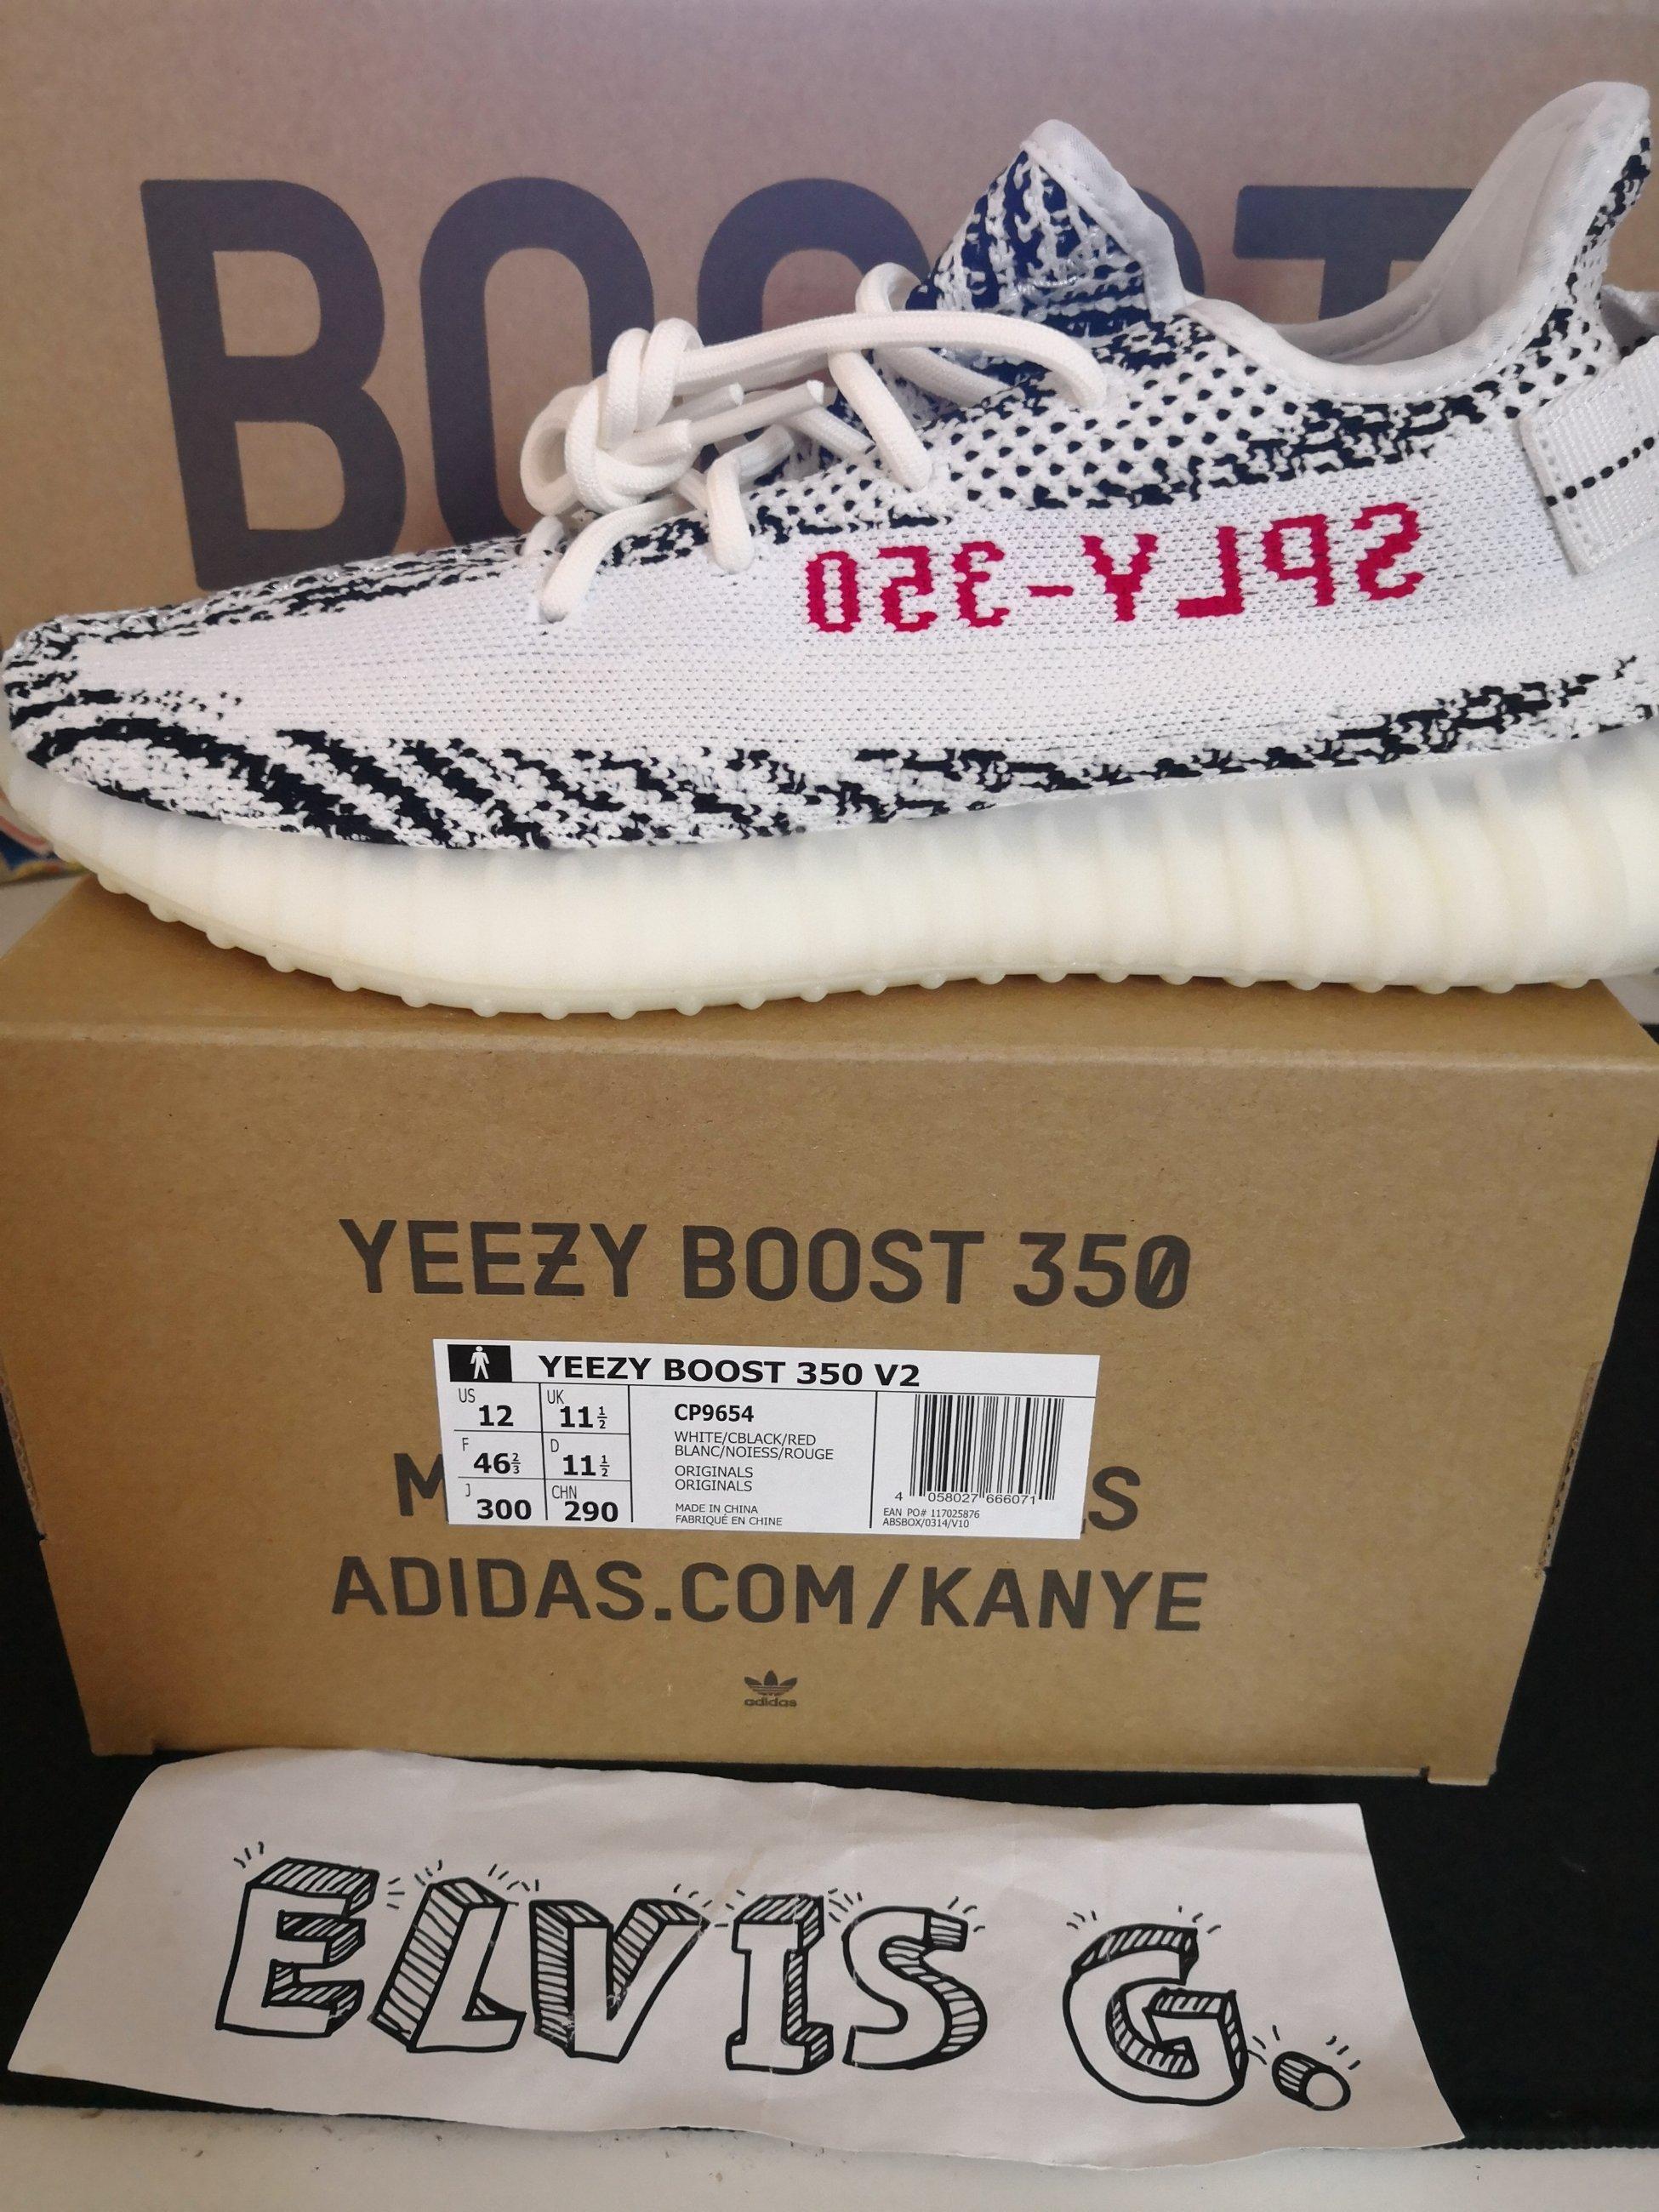 Adidas Yeezy Boost 350 V2 CP9654 Zebra US12 UK11.5